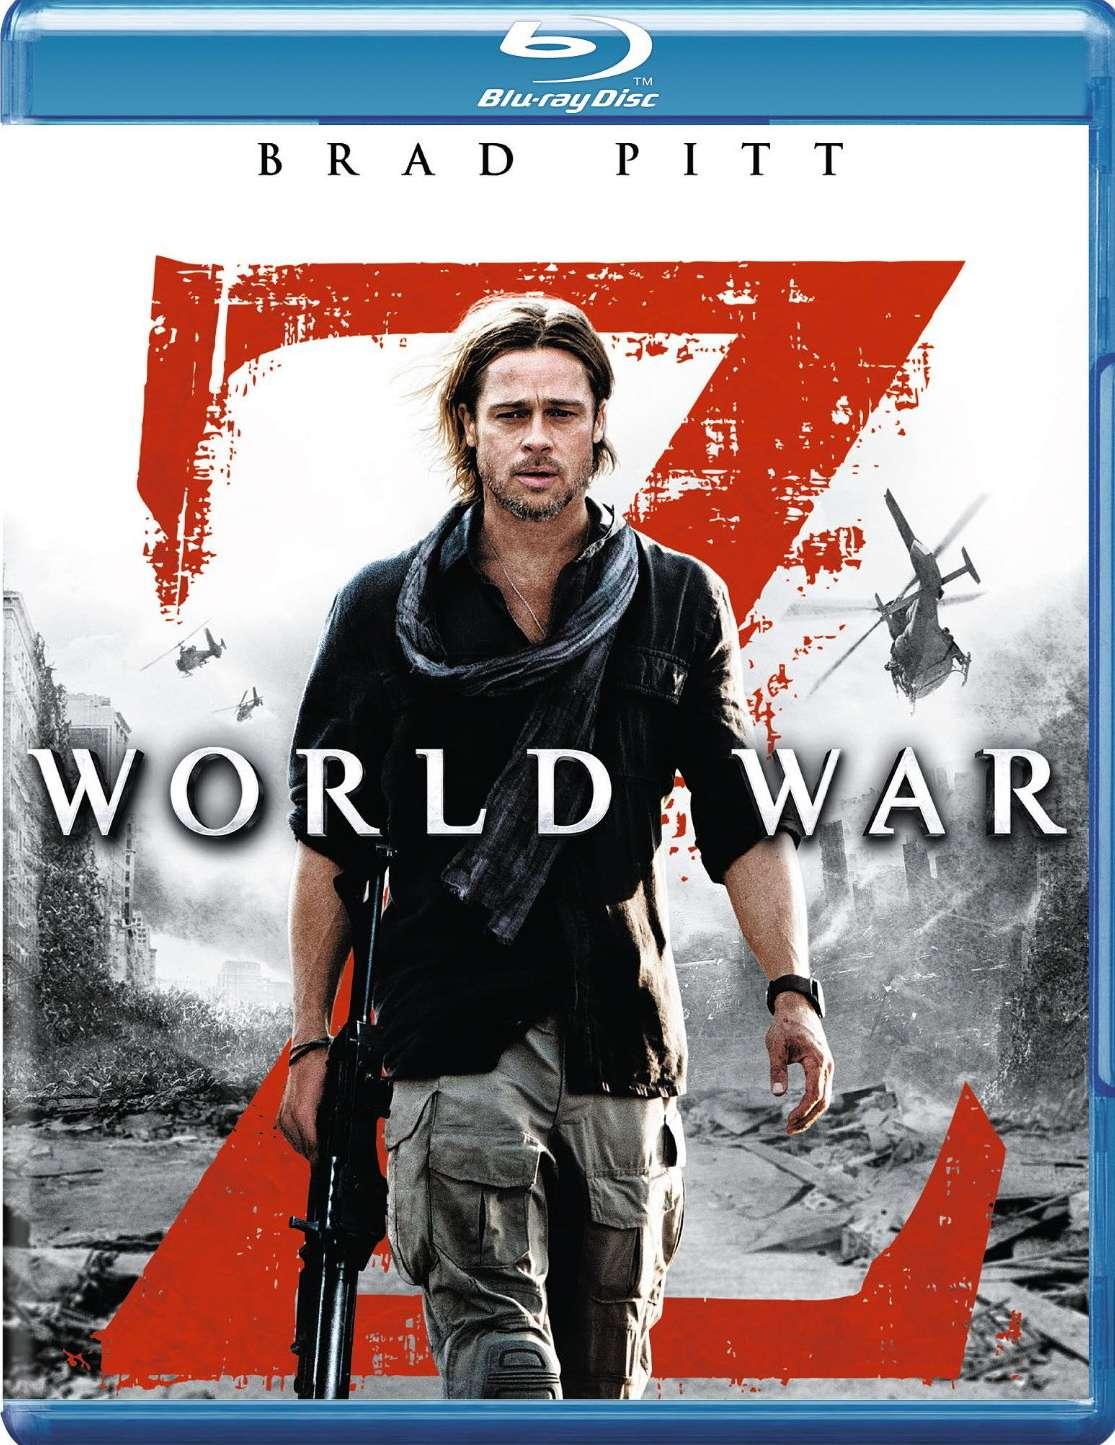 world war z 2013 1080p mkv x264 dts bluray sthd torrent action torrents movies torrents. Black Bedroom Furniture Sets. Home Design Ideas